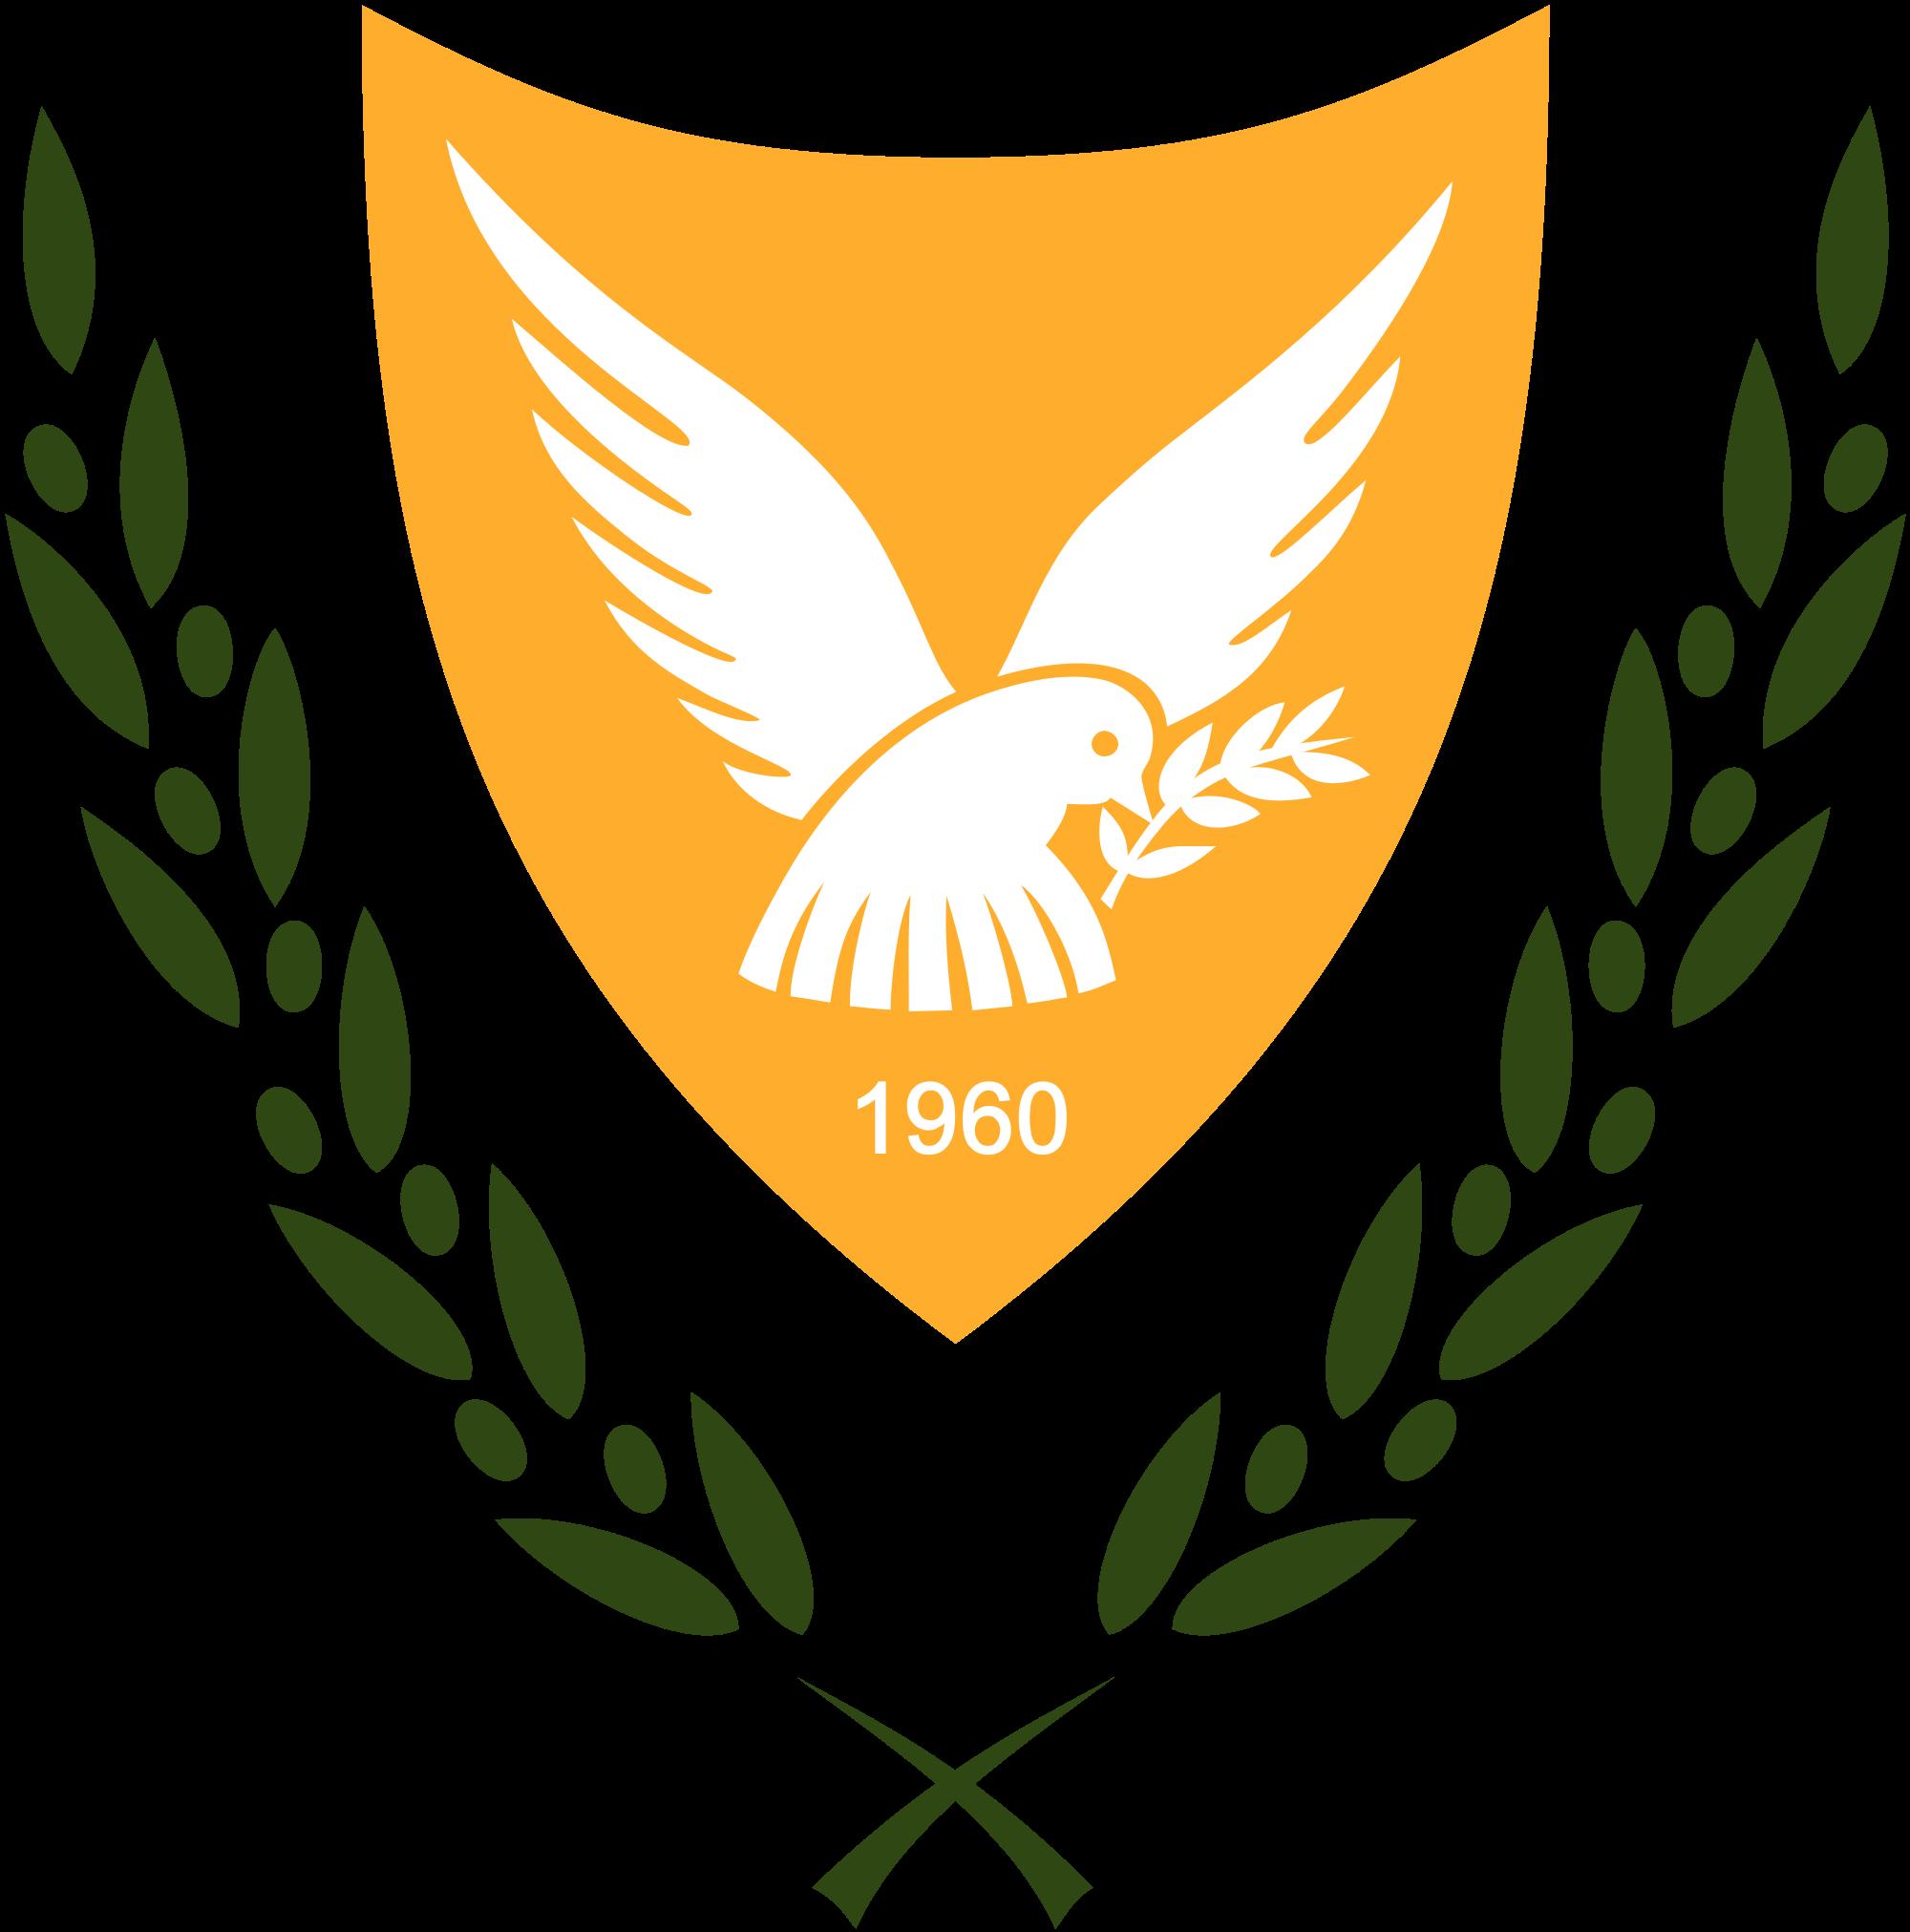 Kyproksen vaakuna